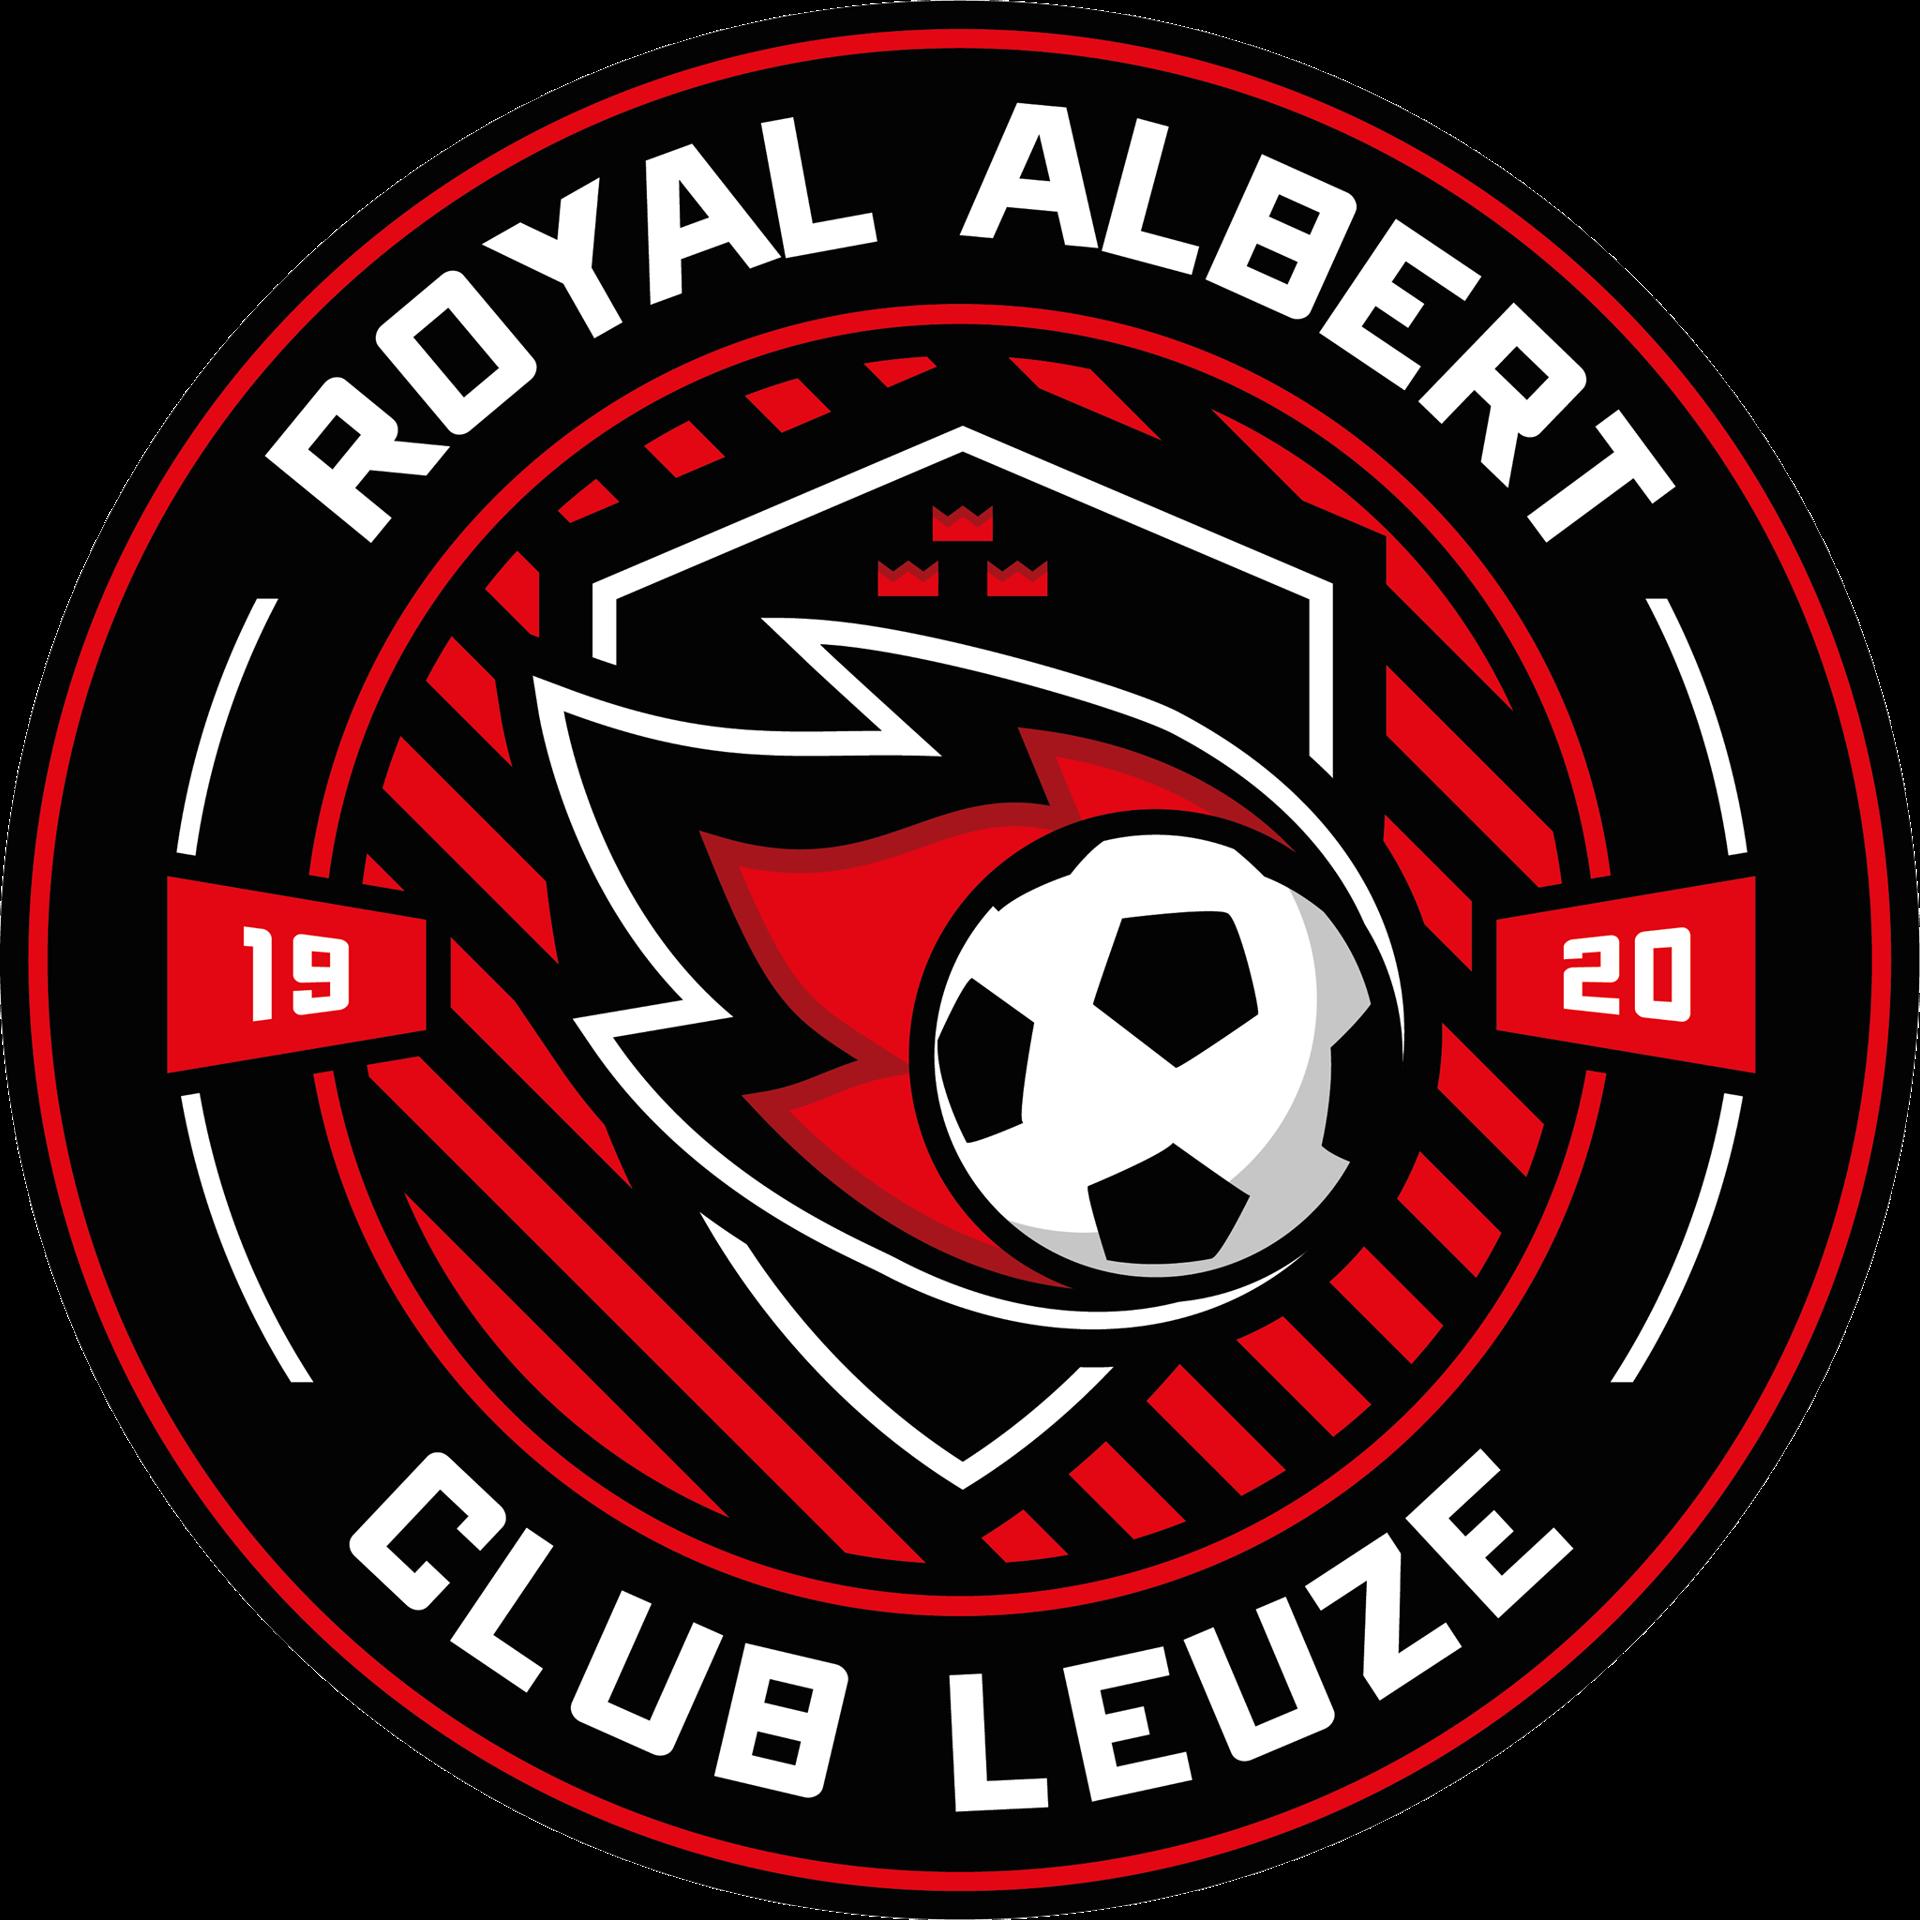 Royal Albert Club Leuze-Longchamps